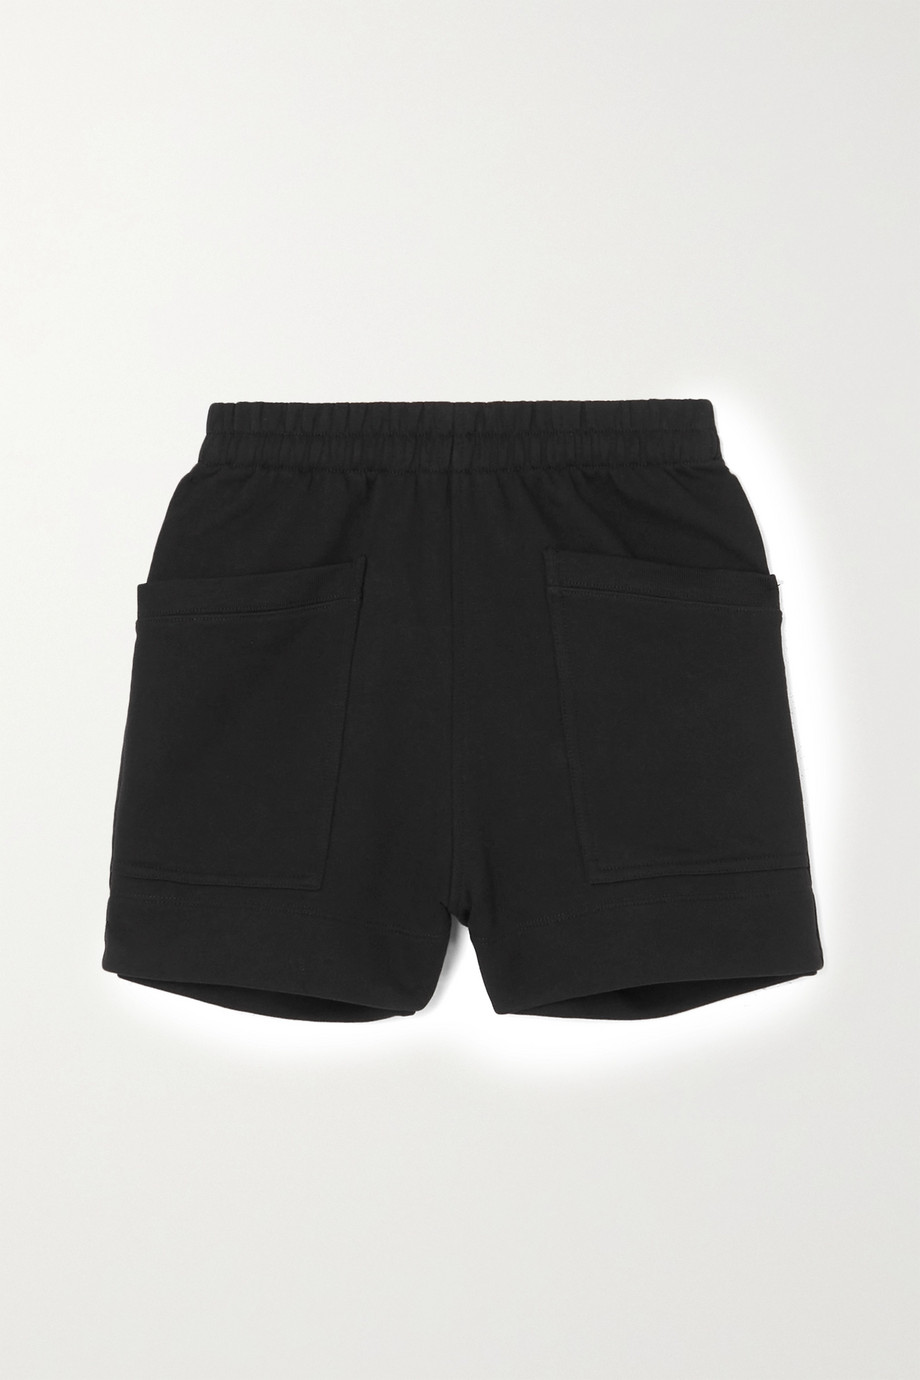 Dries Van Noten Cotton-jersey shorts